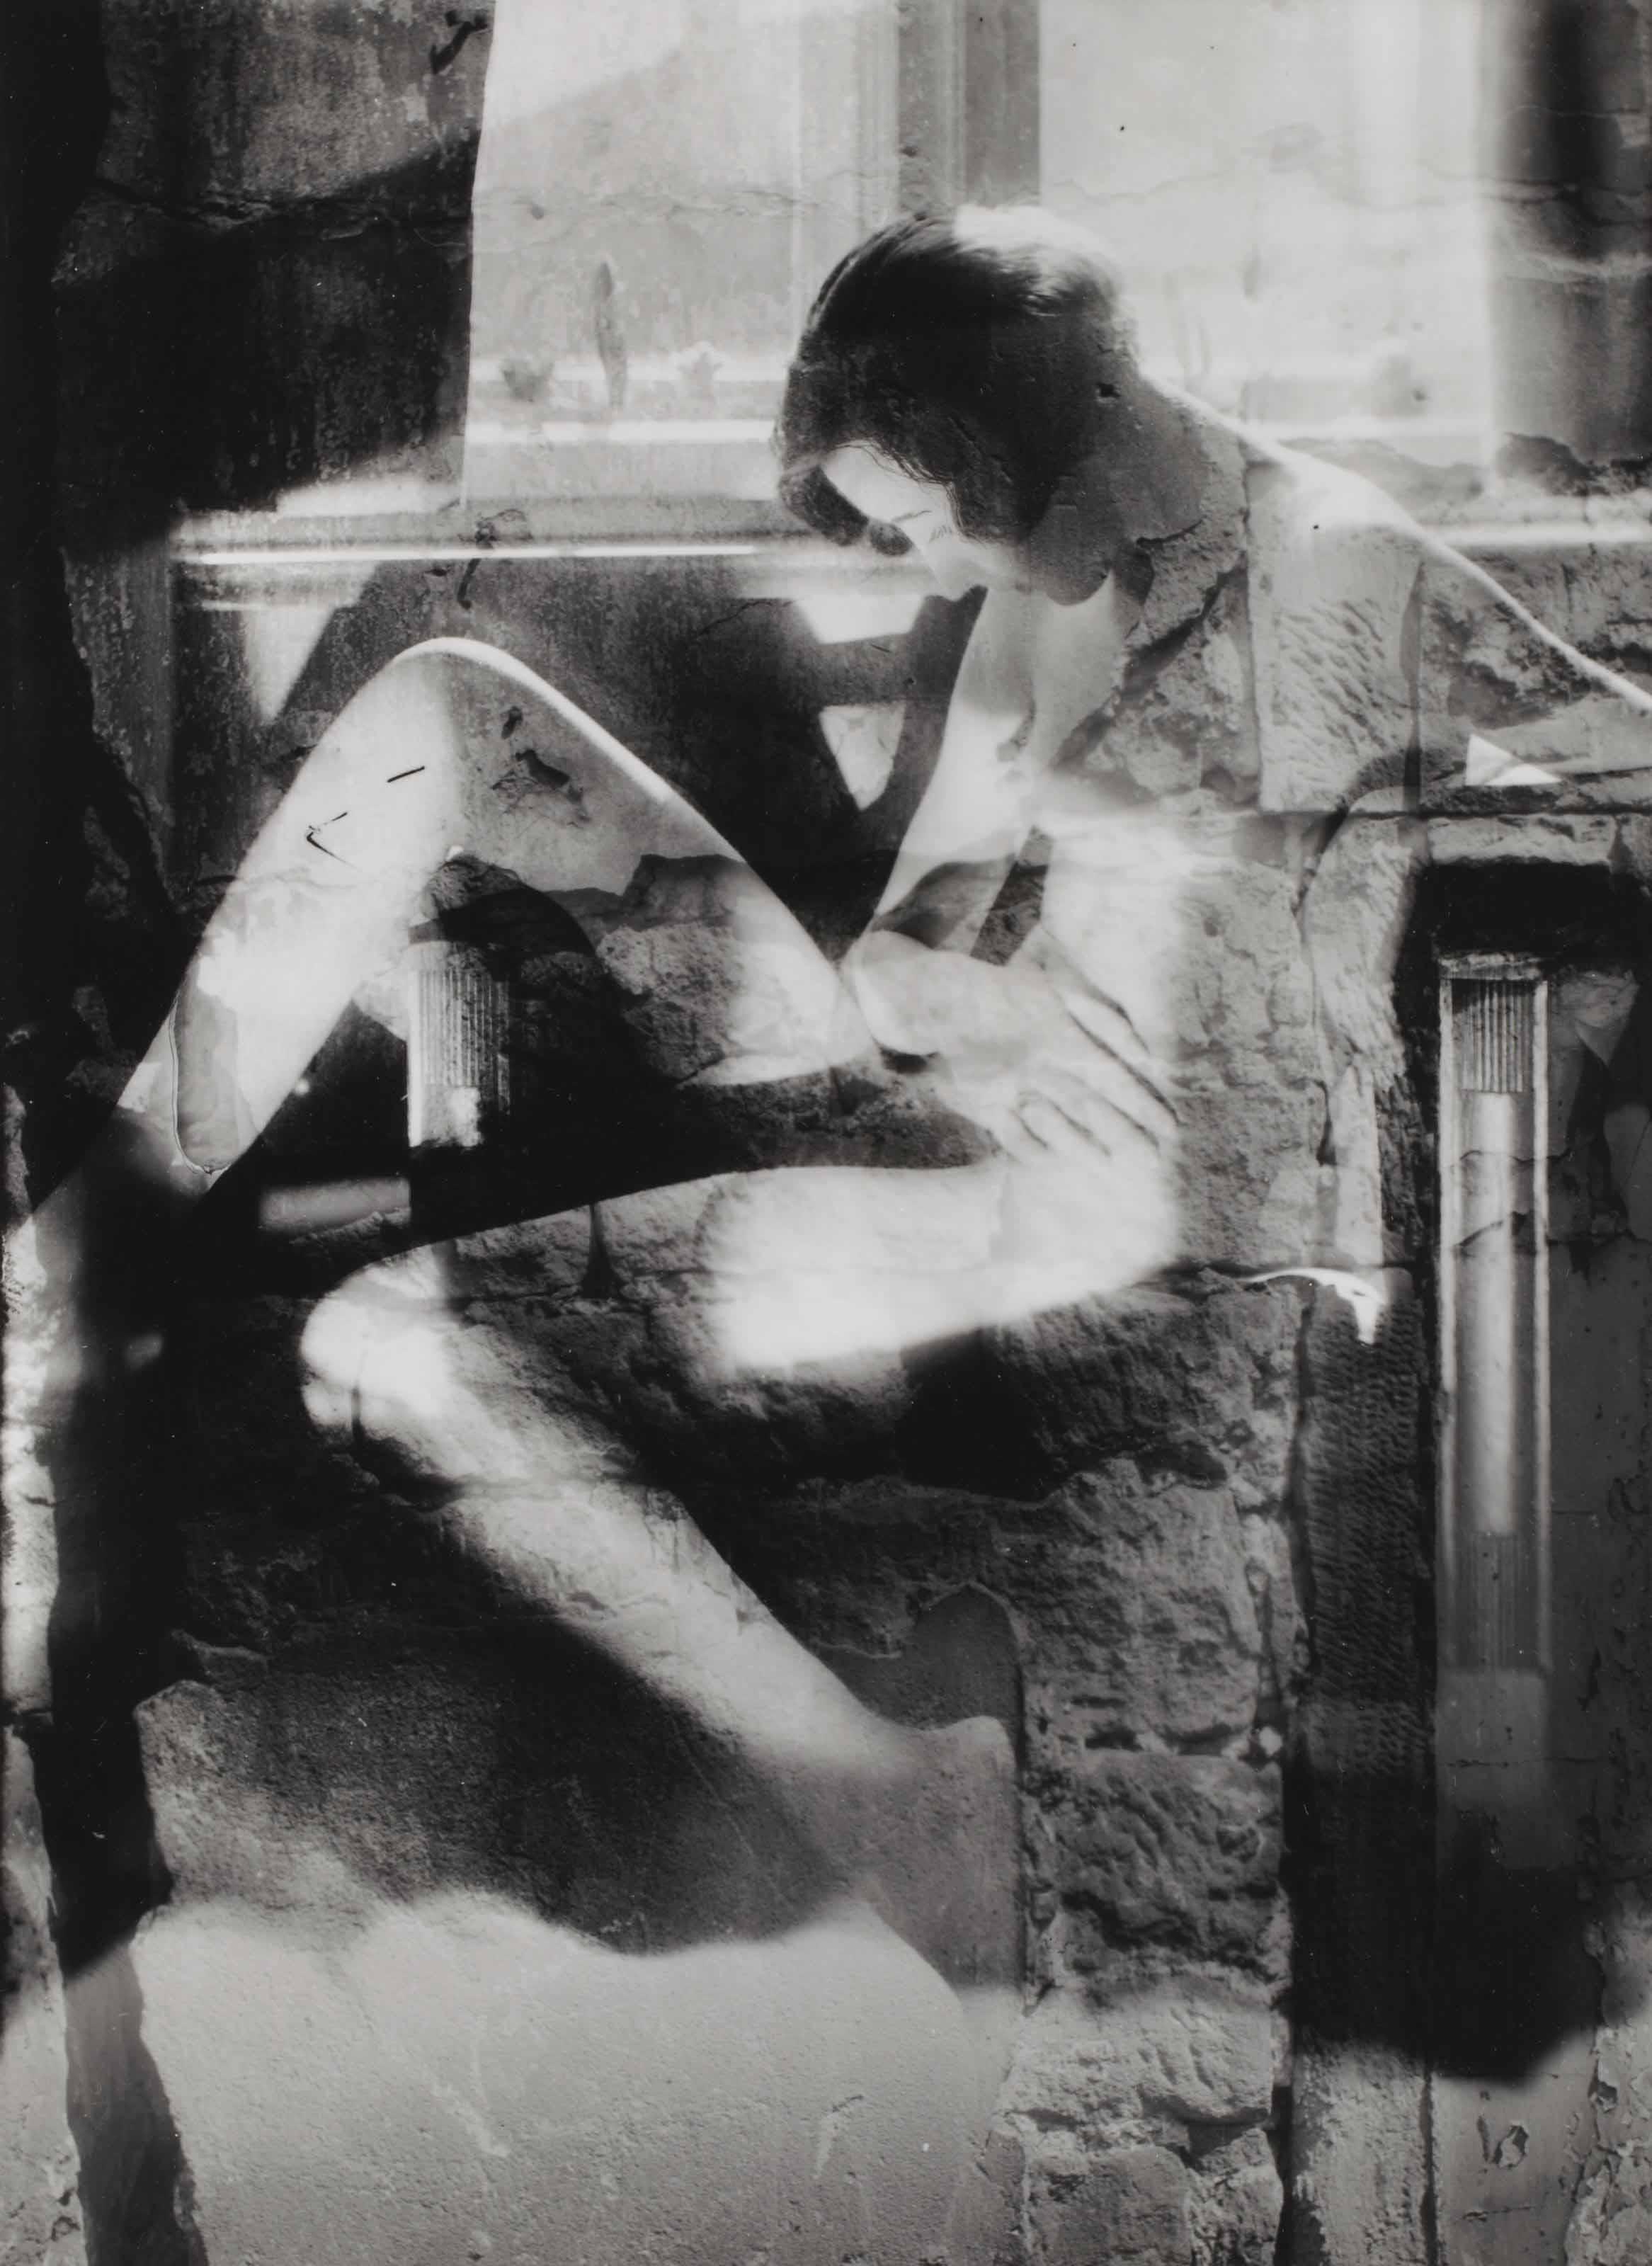 Sans titre (Akt in Gestein - Nu dans la roche), 1928-1932